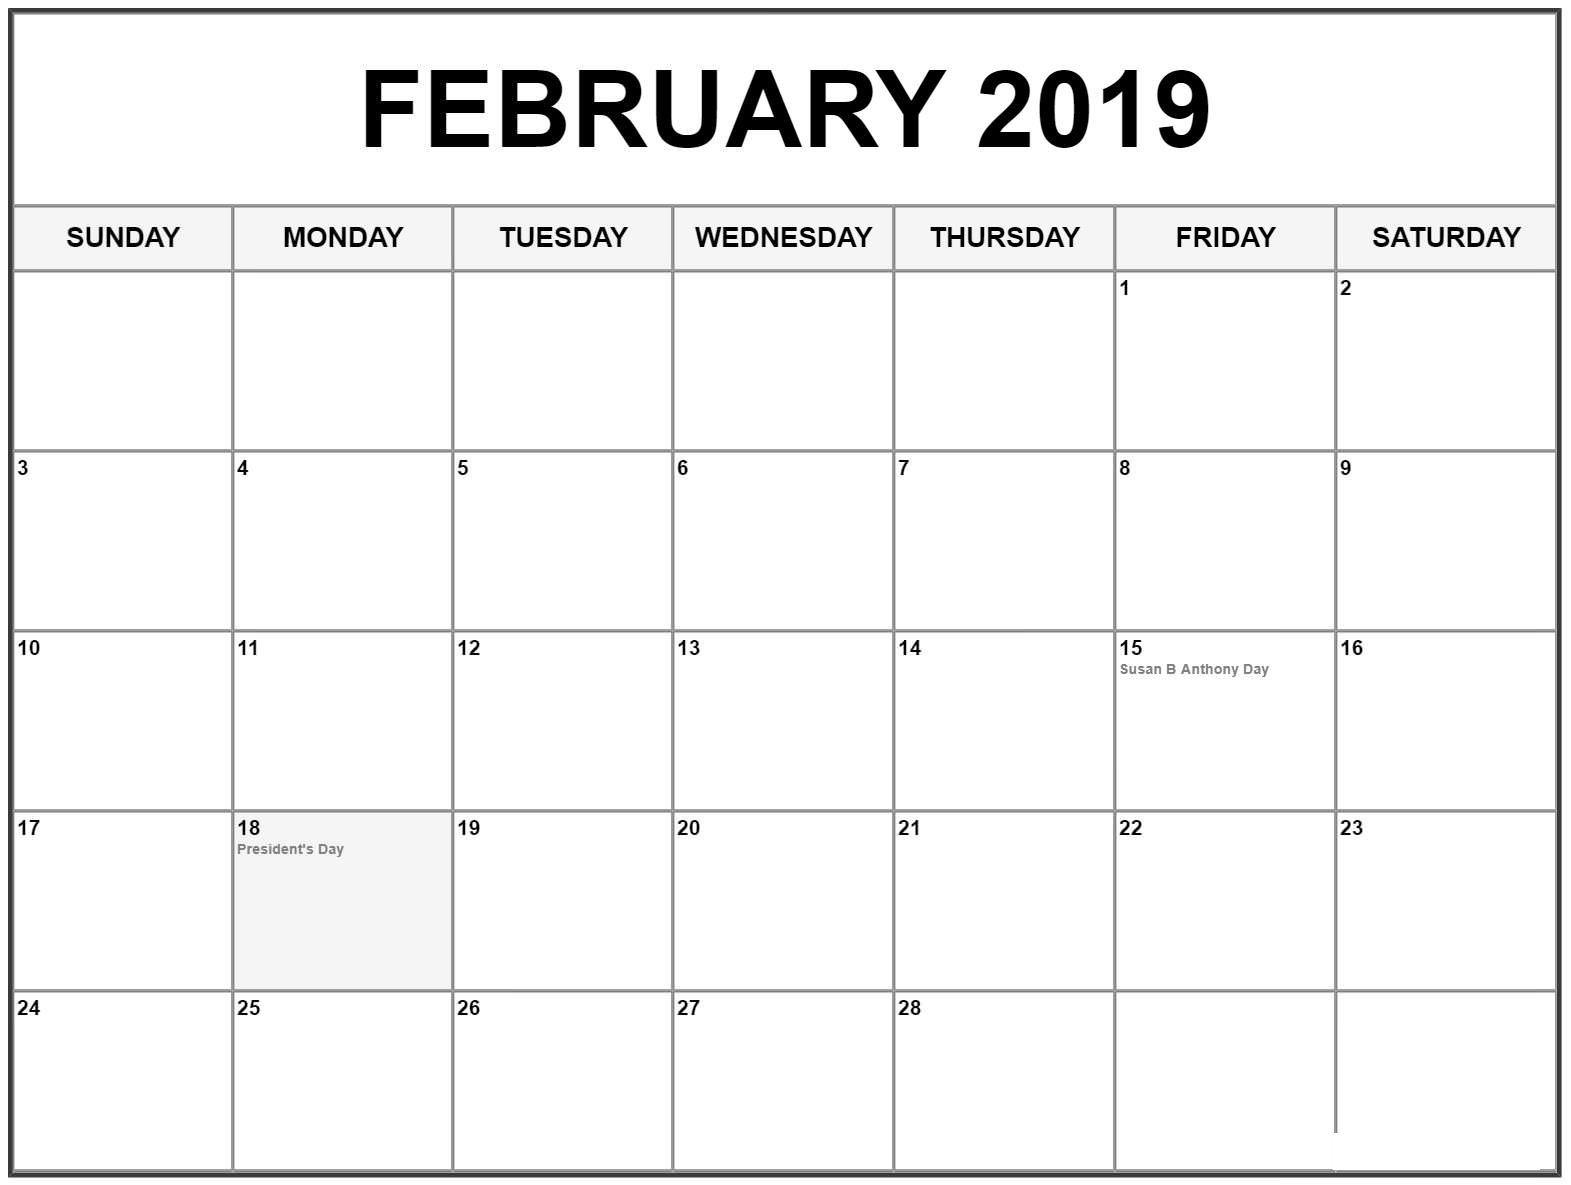 February 2019 Calendar Printable With American Holidays February 2019 Calendar With Holidays Dates | February 2019